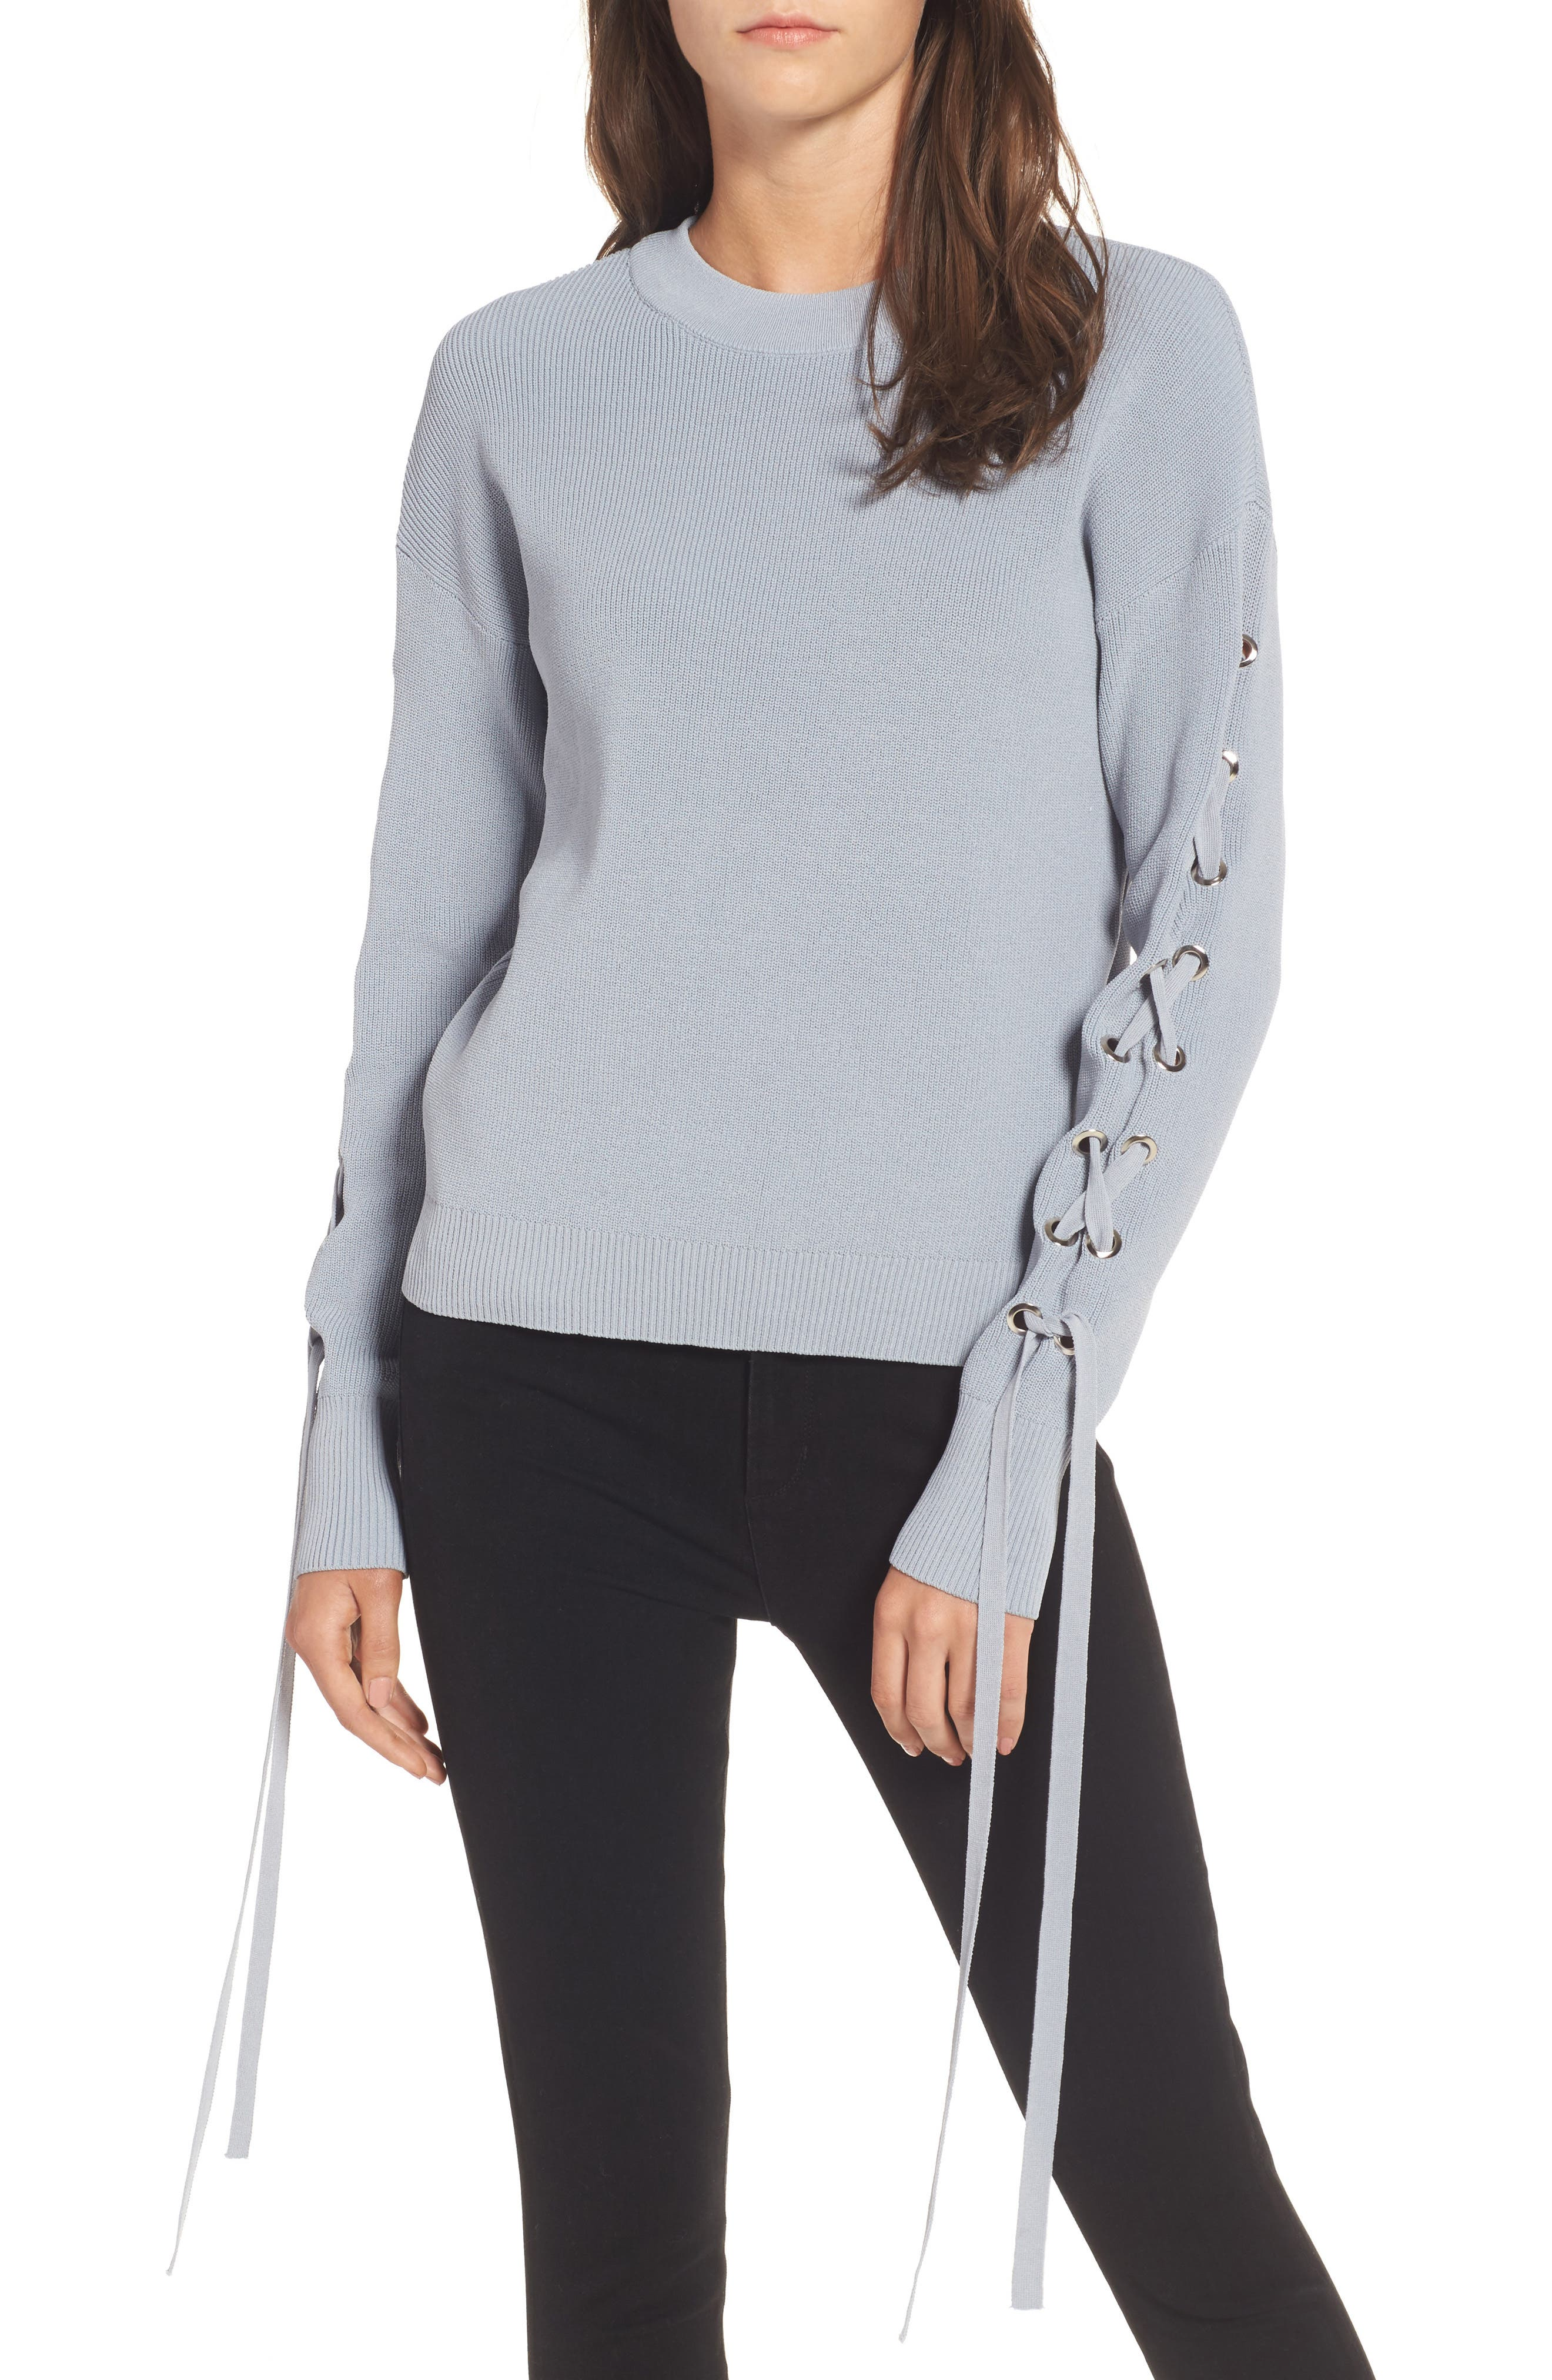 Main Image - J.O.A. Lace-Up Sleeve Sweater